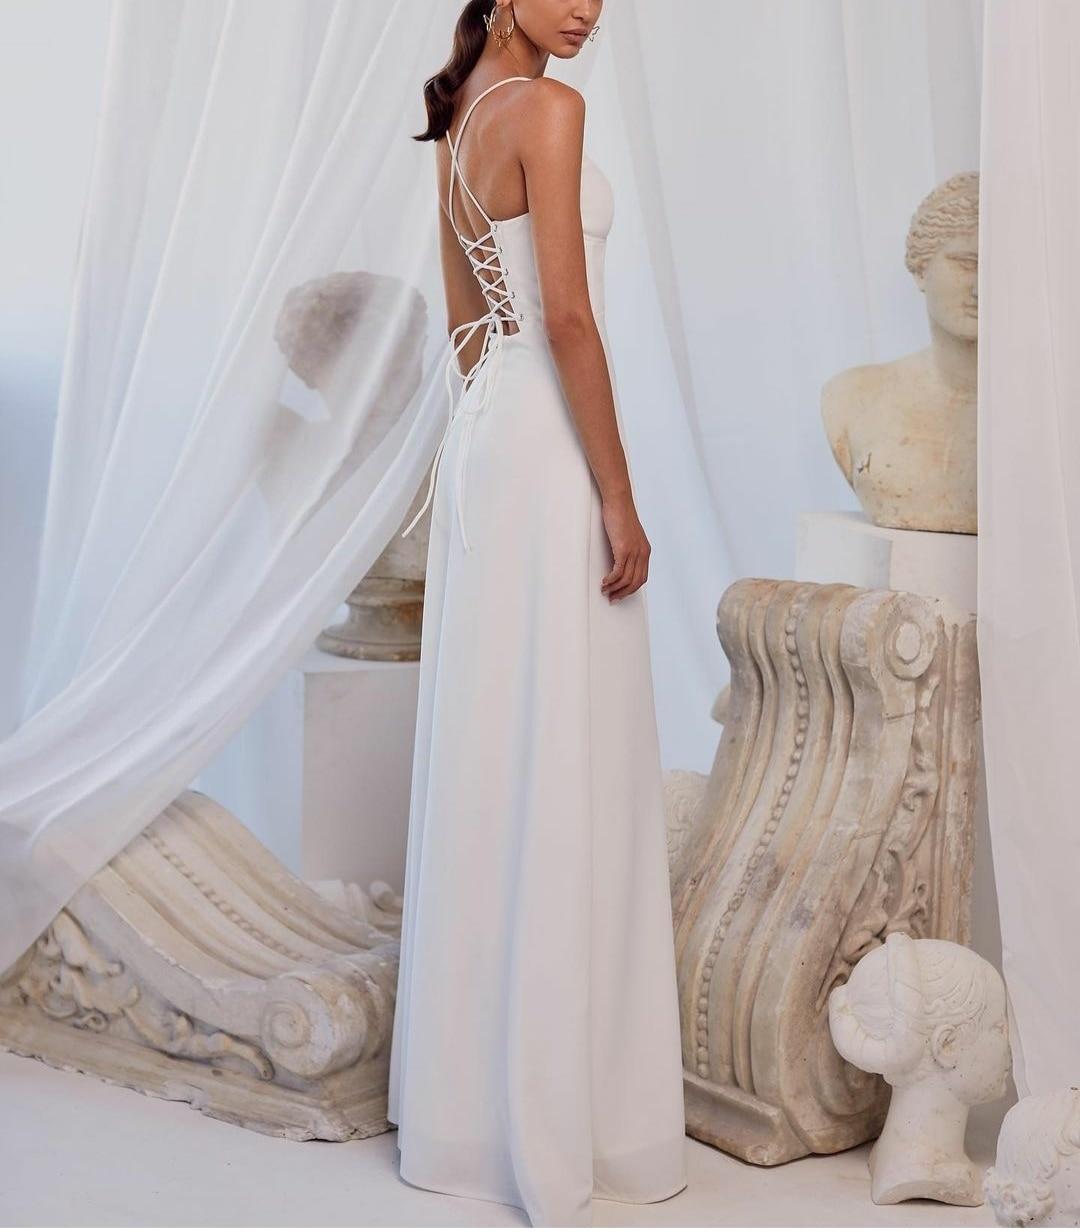 Elegant Long Spaghetti Satin Wedding Dresses with Pockets A-Line Corset Back White Brautkleider Robes de Soirée for Women